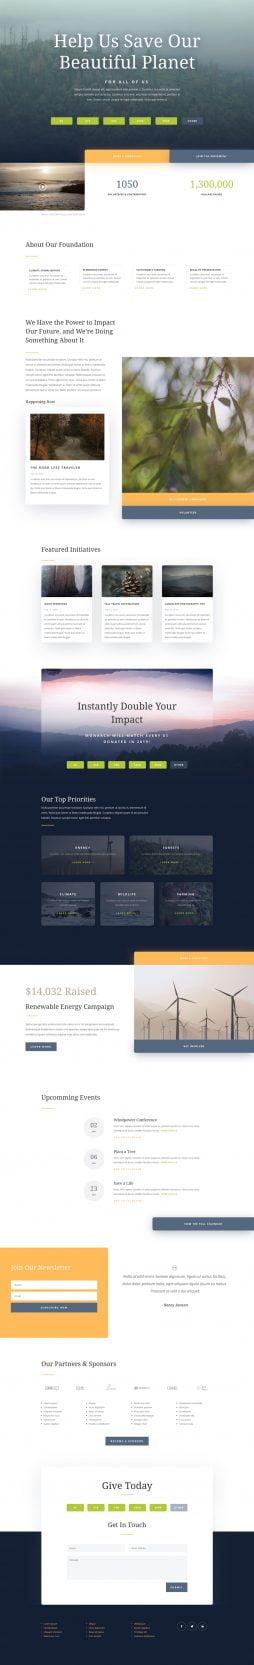 environmental-nonprofit-landing-page-254x1665